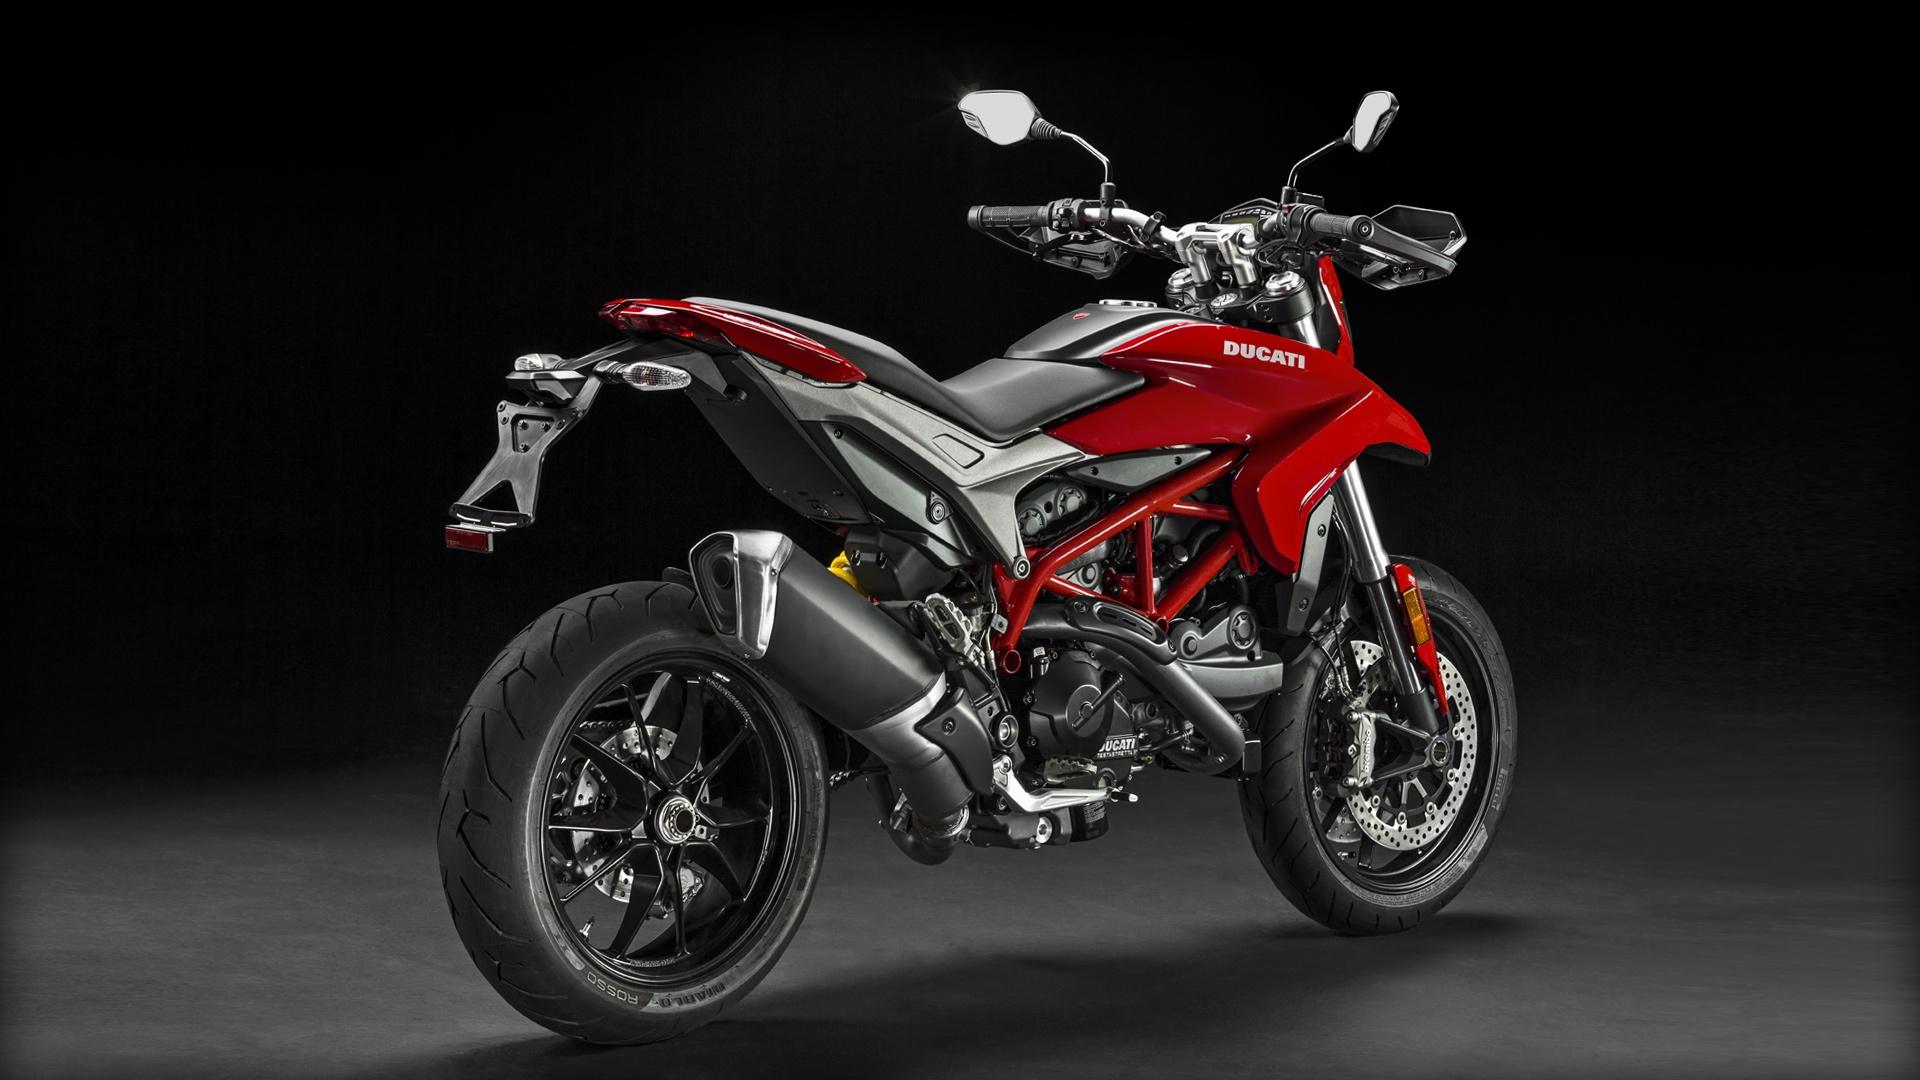 Ducati Hypermotard 939 for Sale UK - Ducati Manchester